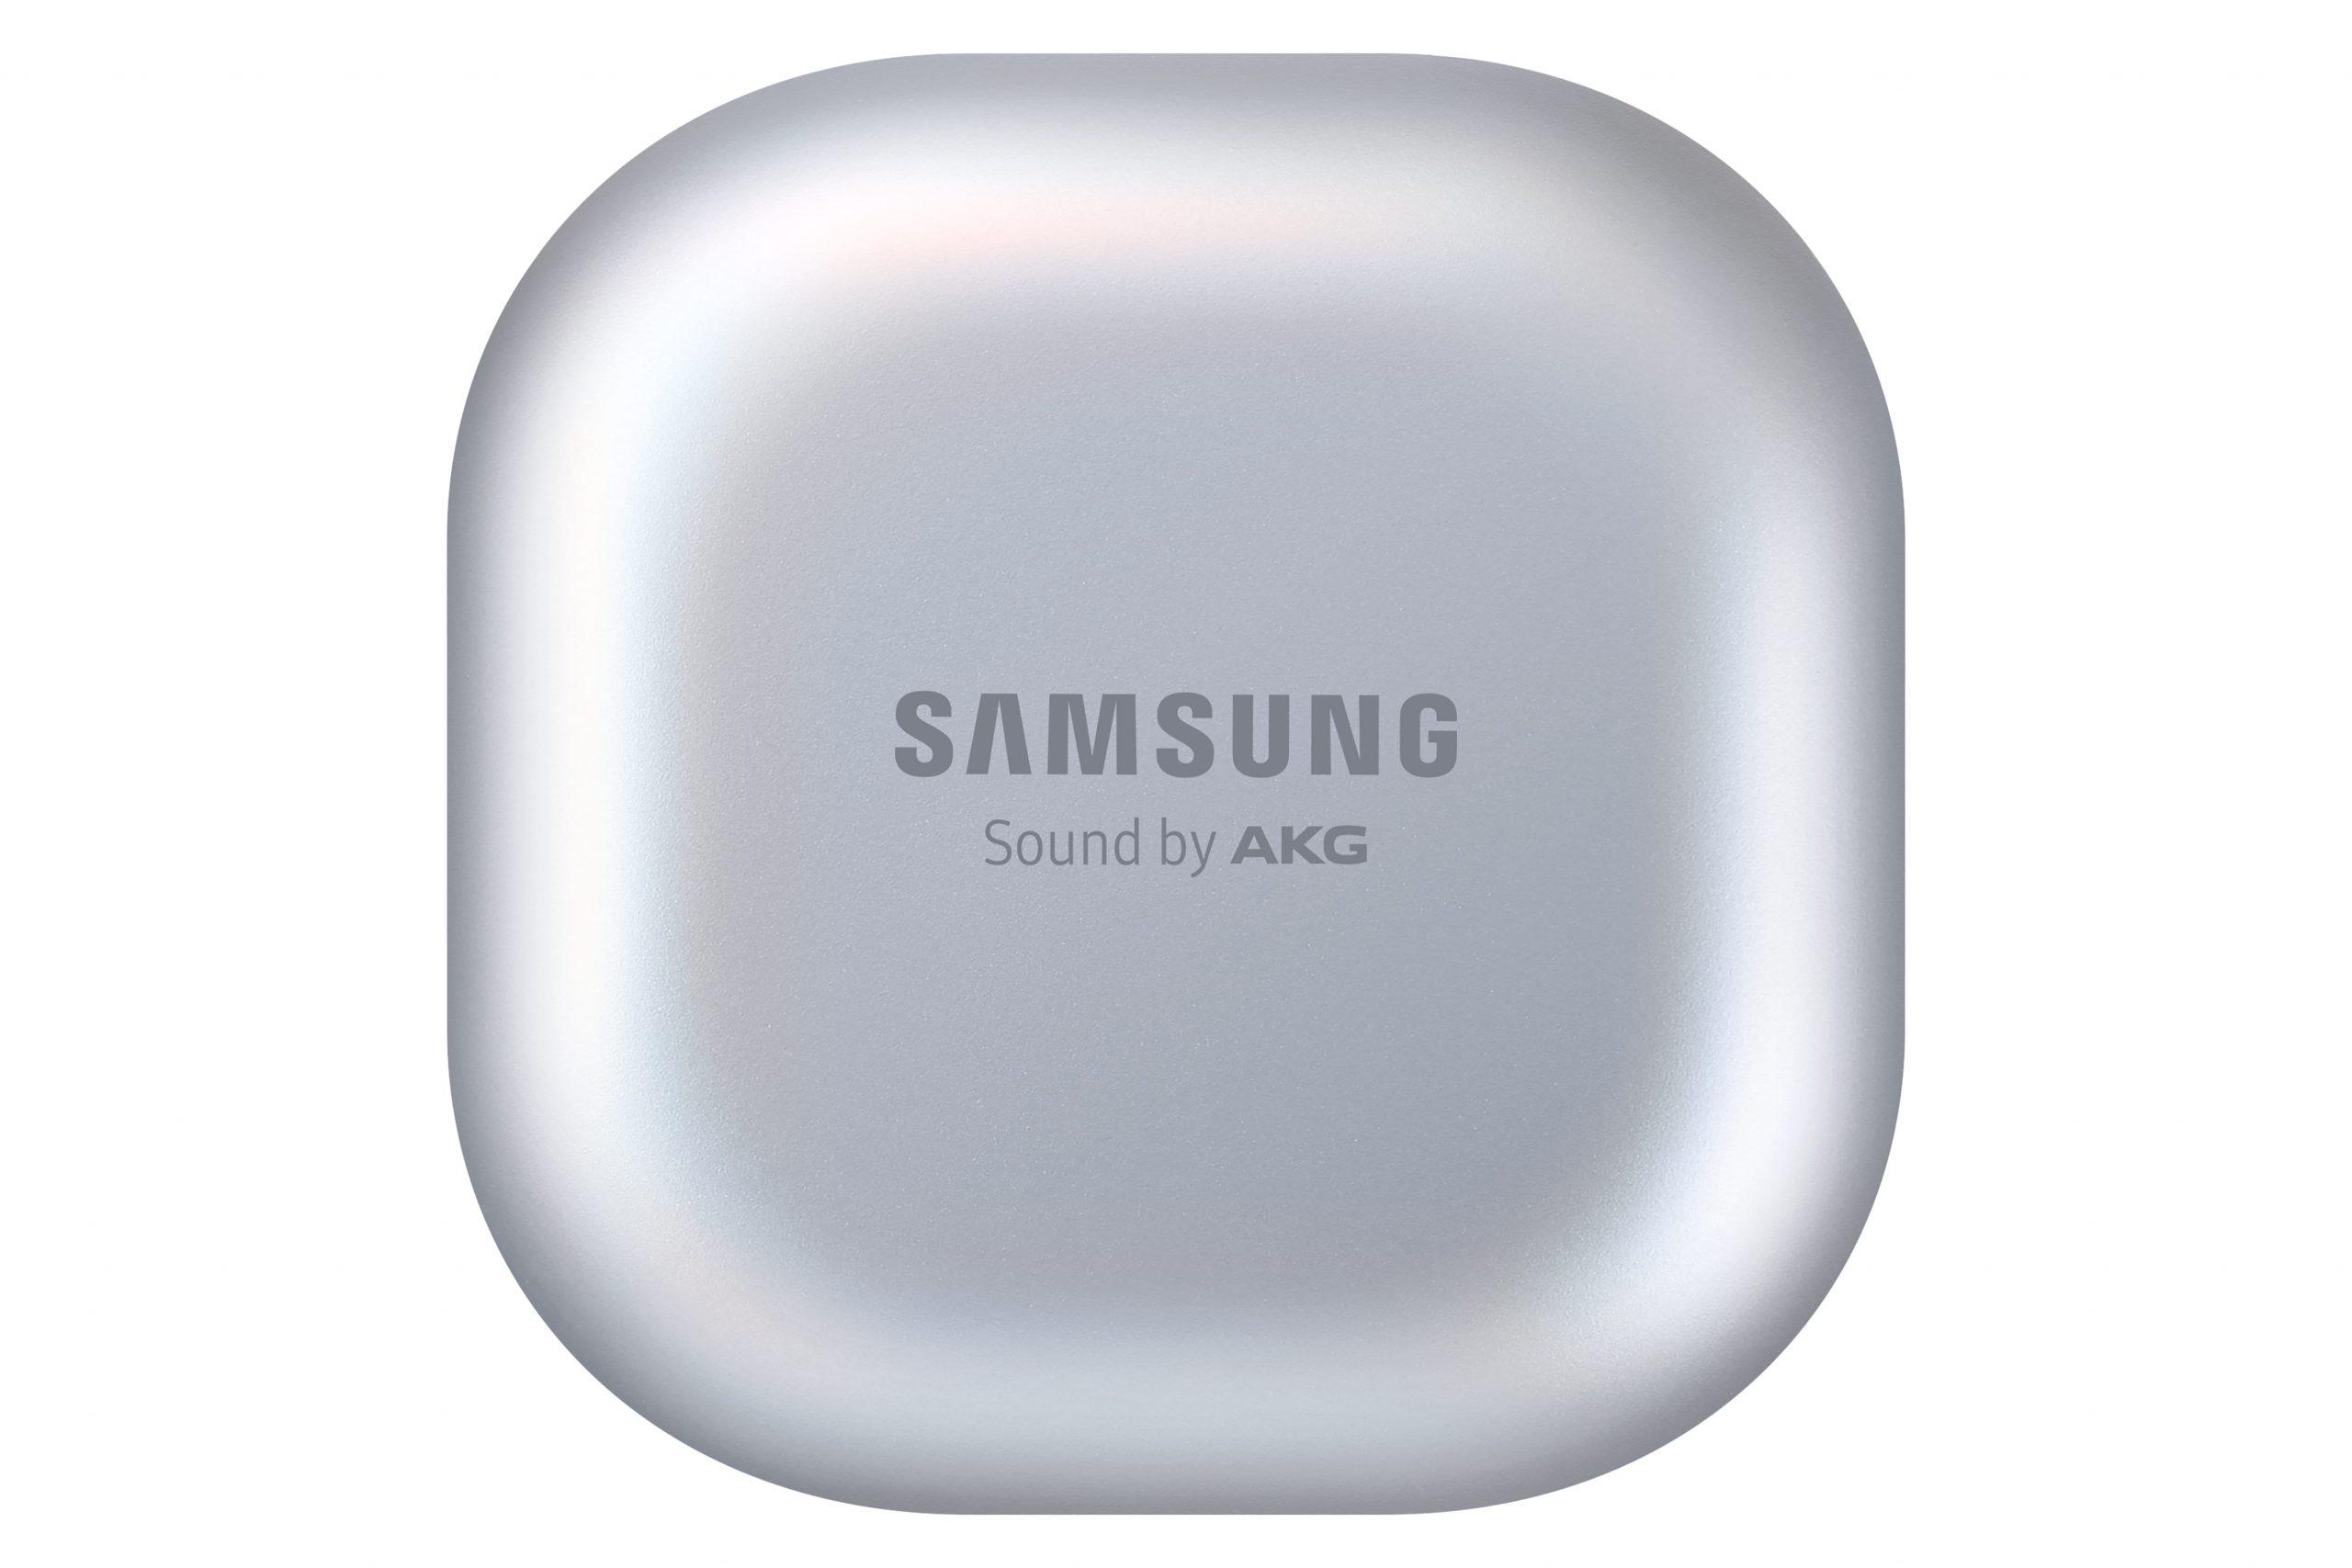 Samsung Galaxy Buds Pro Phantom Silver, Samsung True Wireless Earbuds, Samsung Singapore